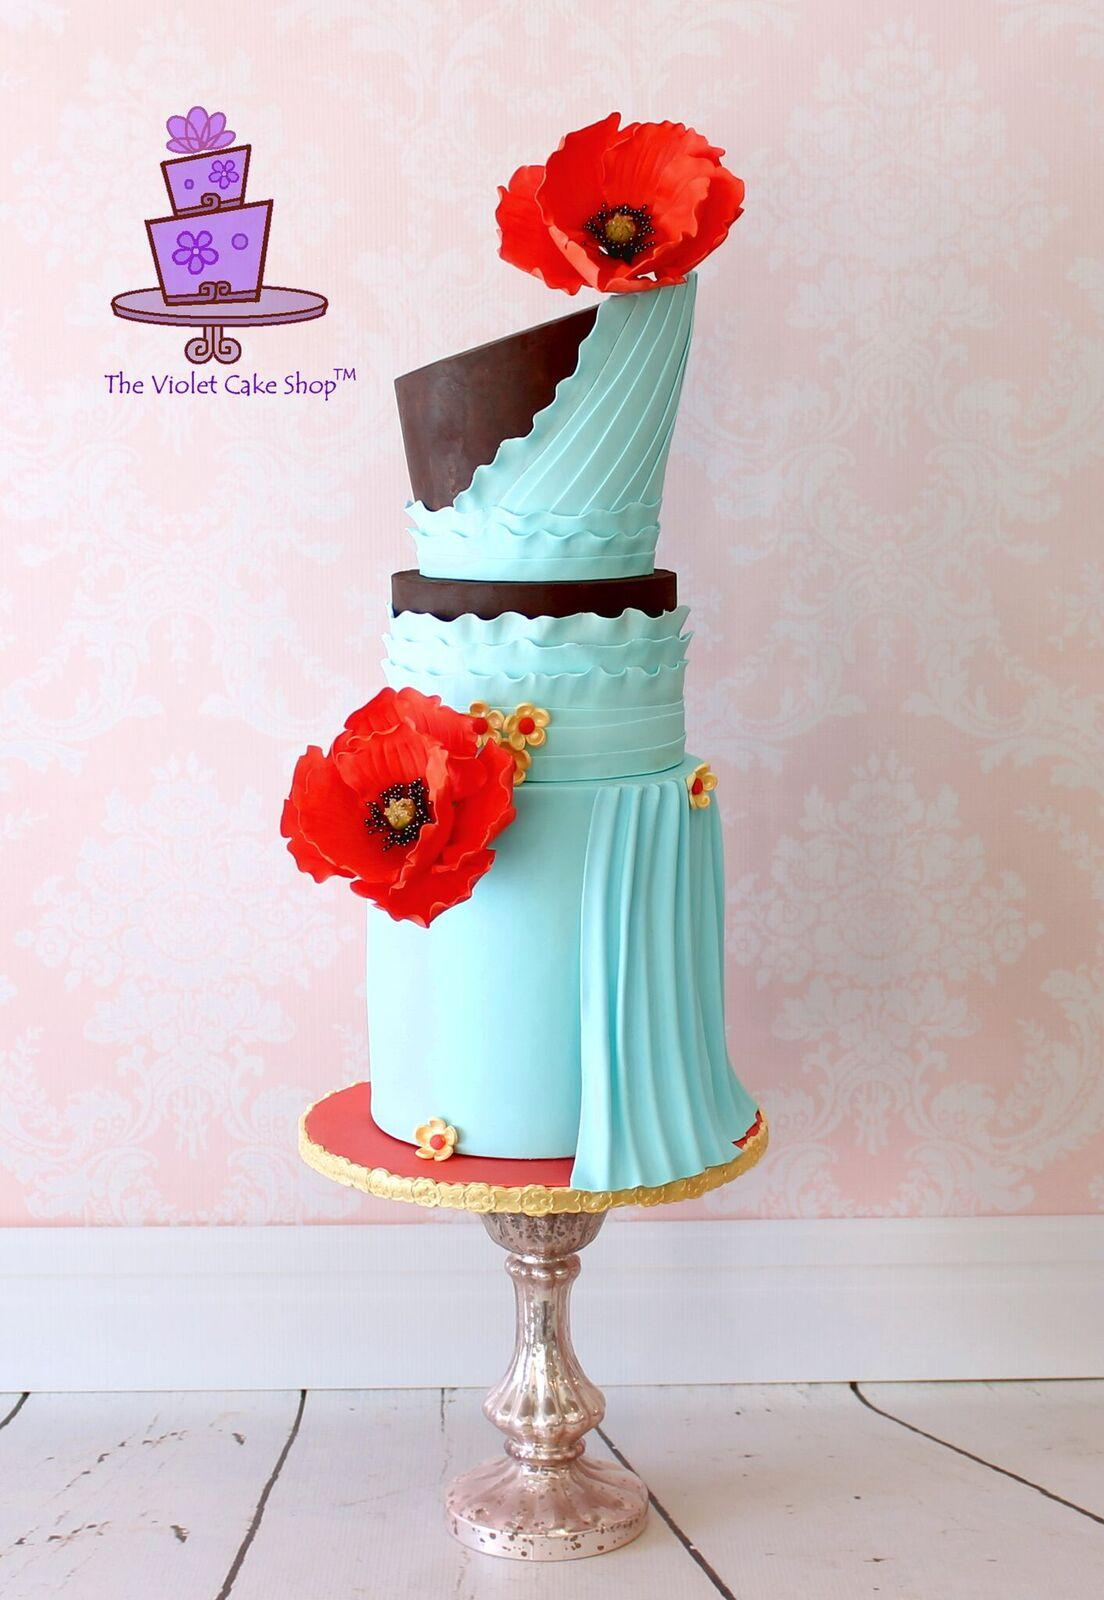 Sugar Poppies and draped dress cake